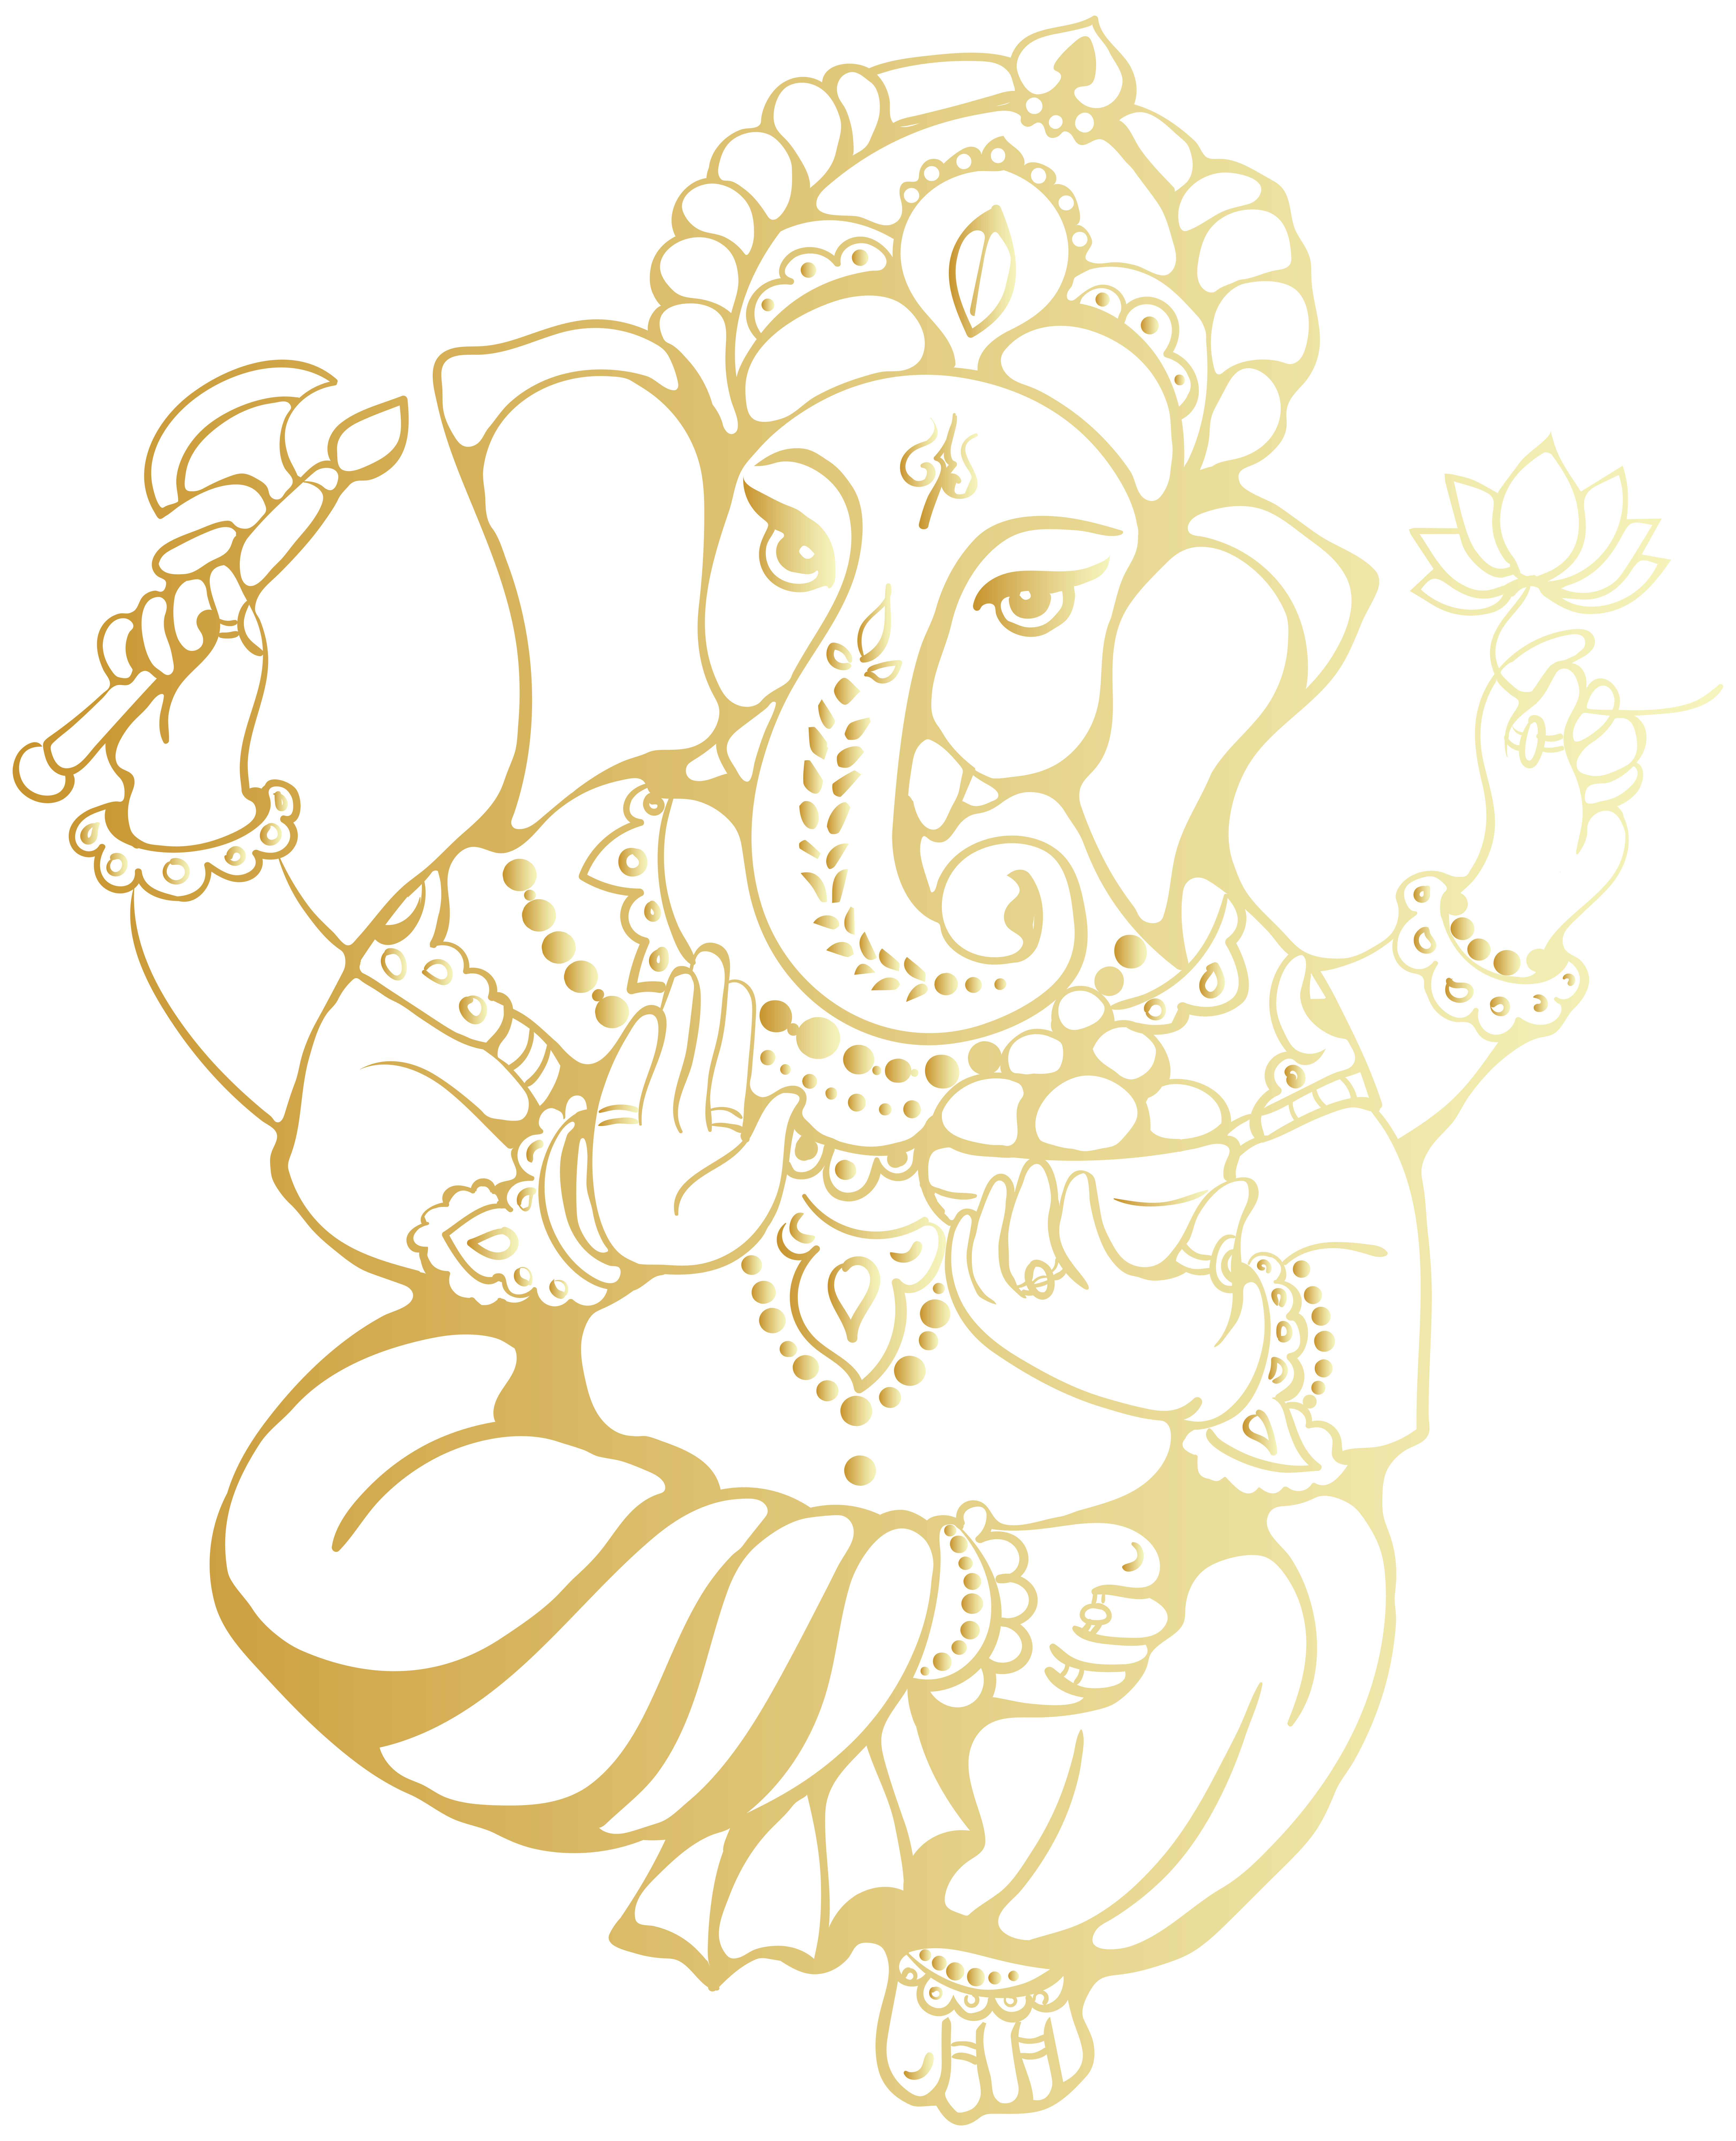 Www Hindu God Wallpaper Com Cute Ganeshji Pin By Natalia Goden On Weddings In 2019 Ganesha Art